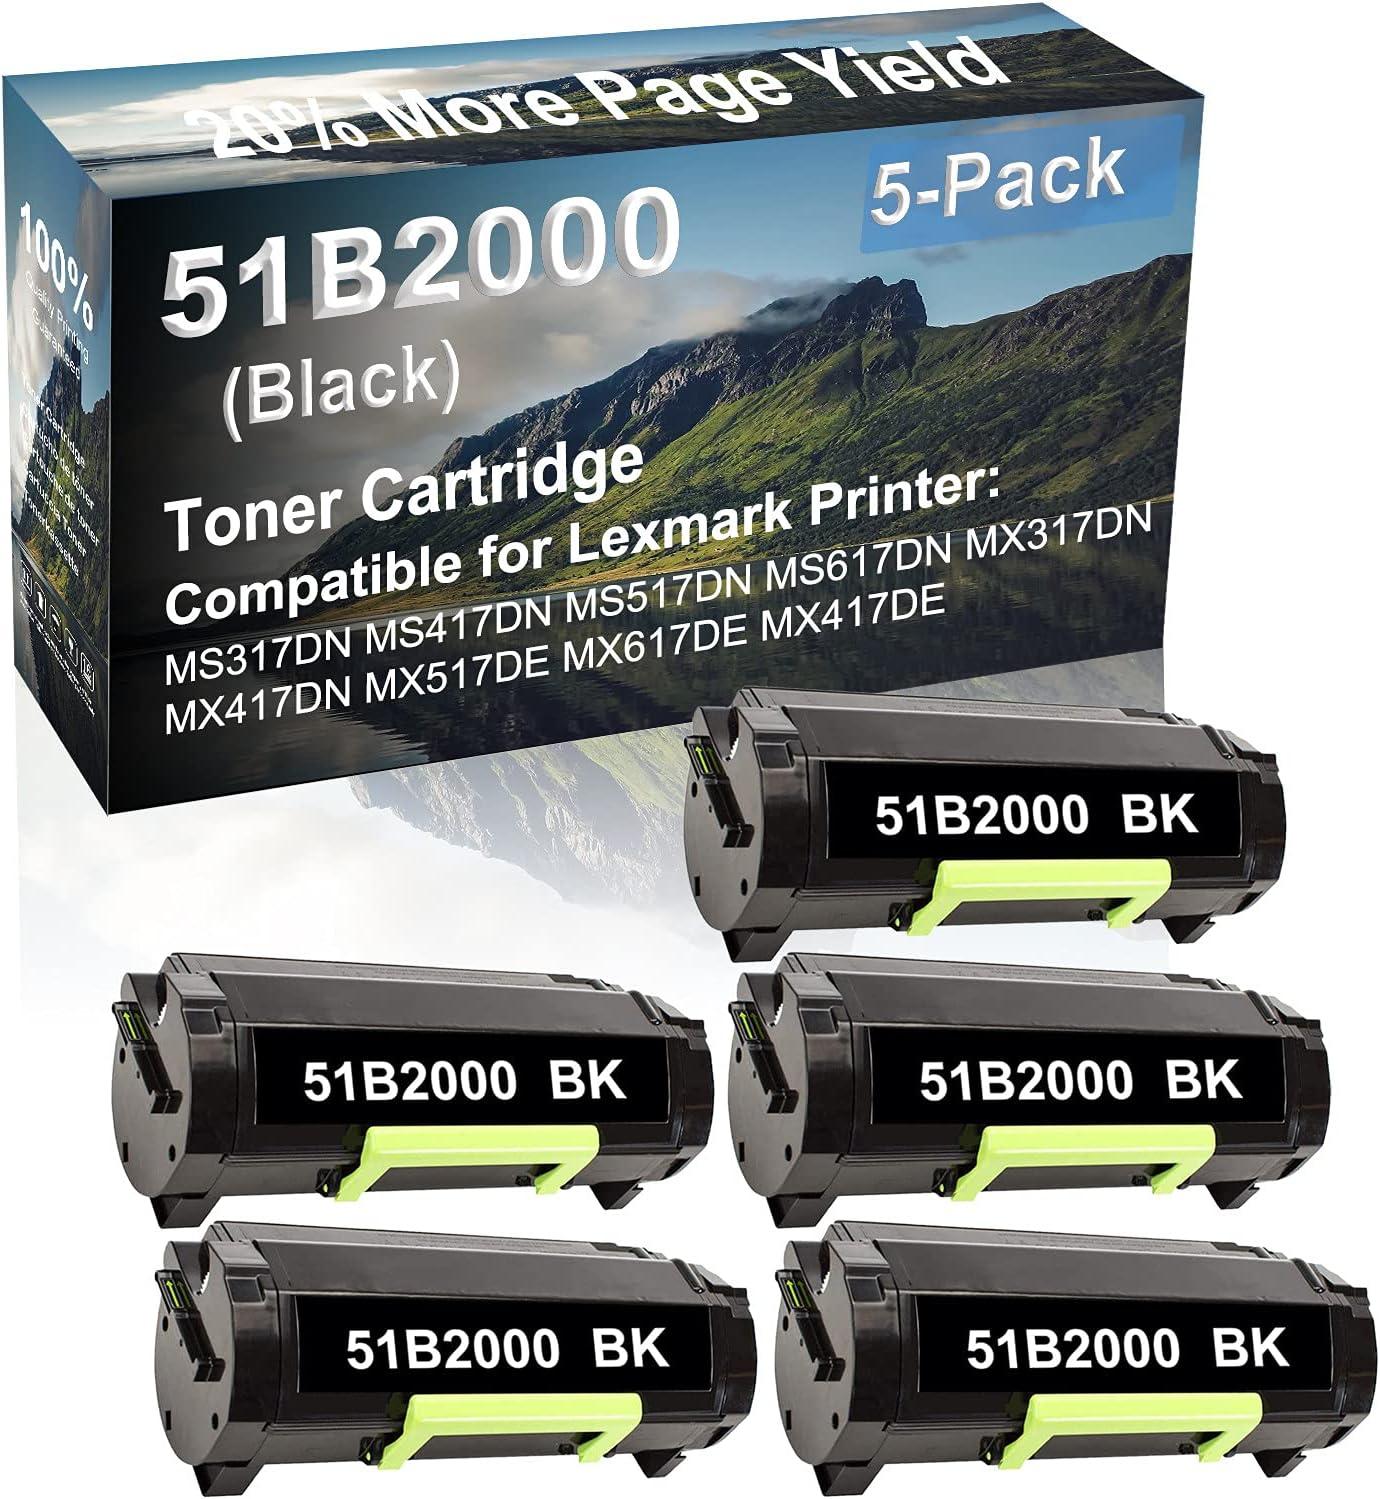 5-Pack Compatible High Capacity MX517DE MX617DE MX417DE Printer Toner Cartridge Replacement for Lexmark 51B2000 Printer Cartridge (Black)